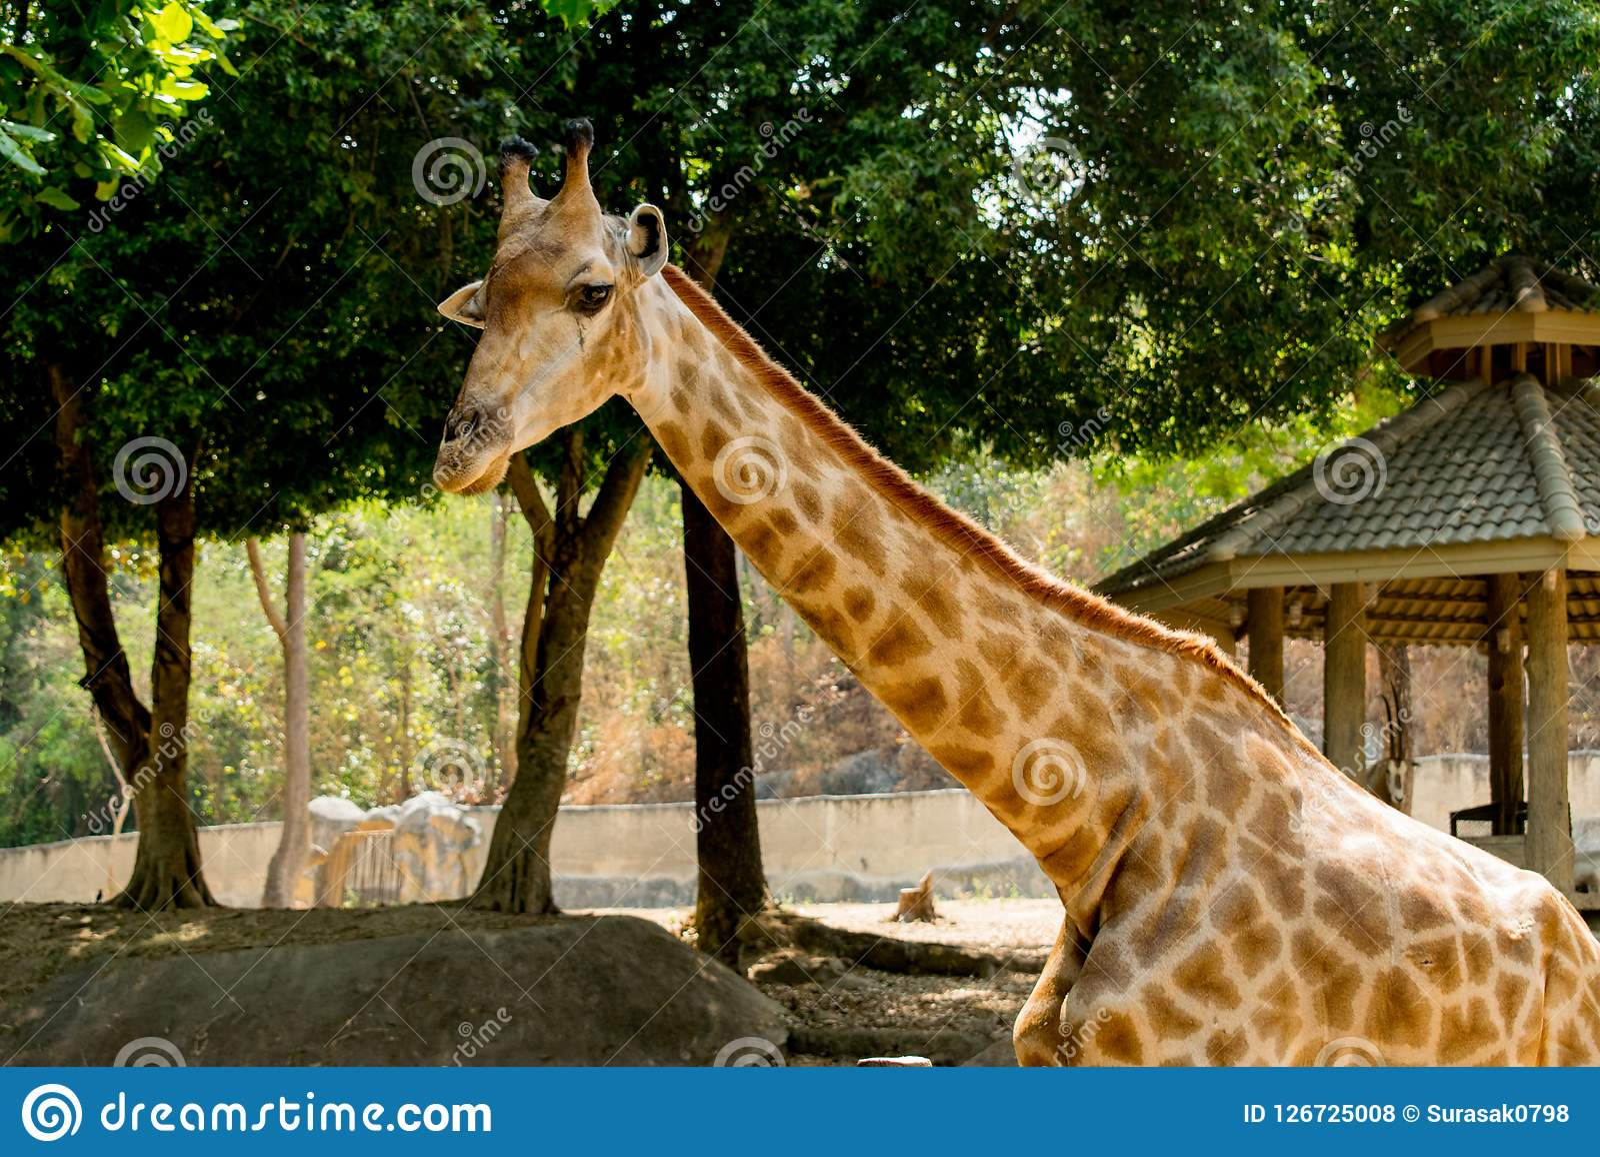 Girafe dans le mammifère de faune de nature